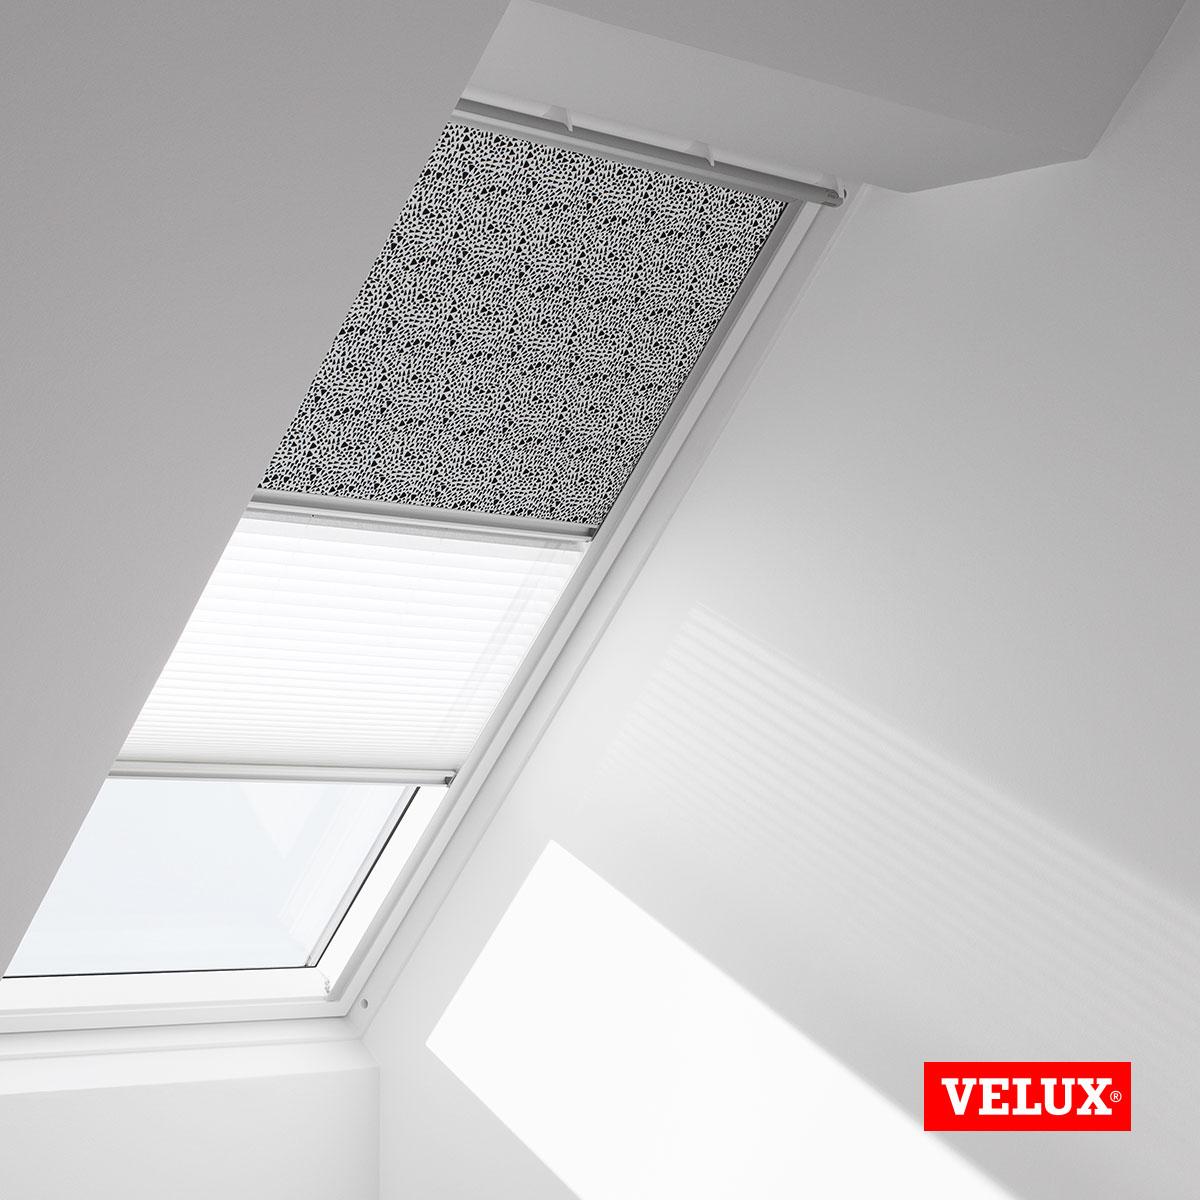 velux mk08 cheap velux skylight blinds night u day navy window code mk mm x mm visible glass. Black Bedroom Furniture Sets. Home Design Ideas